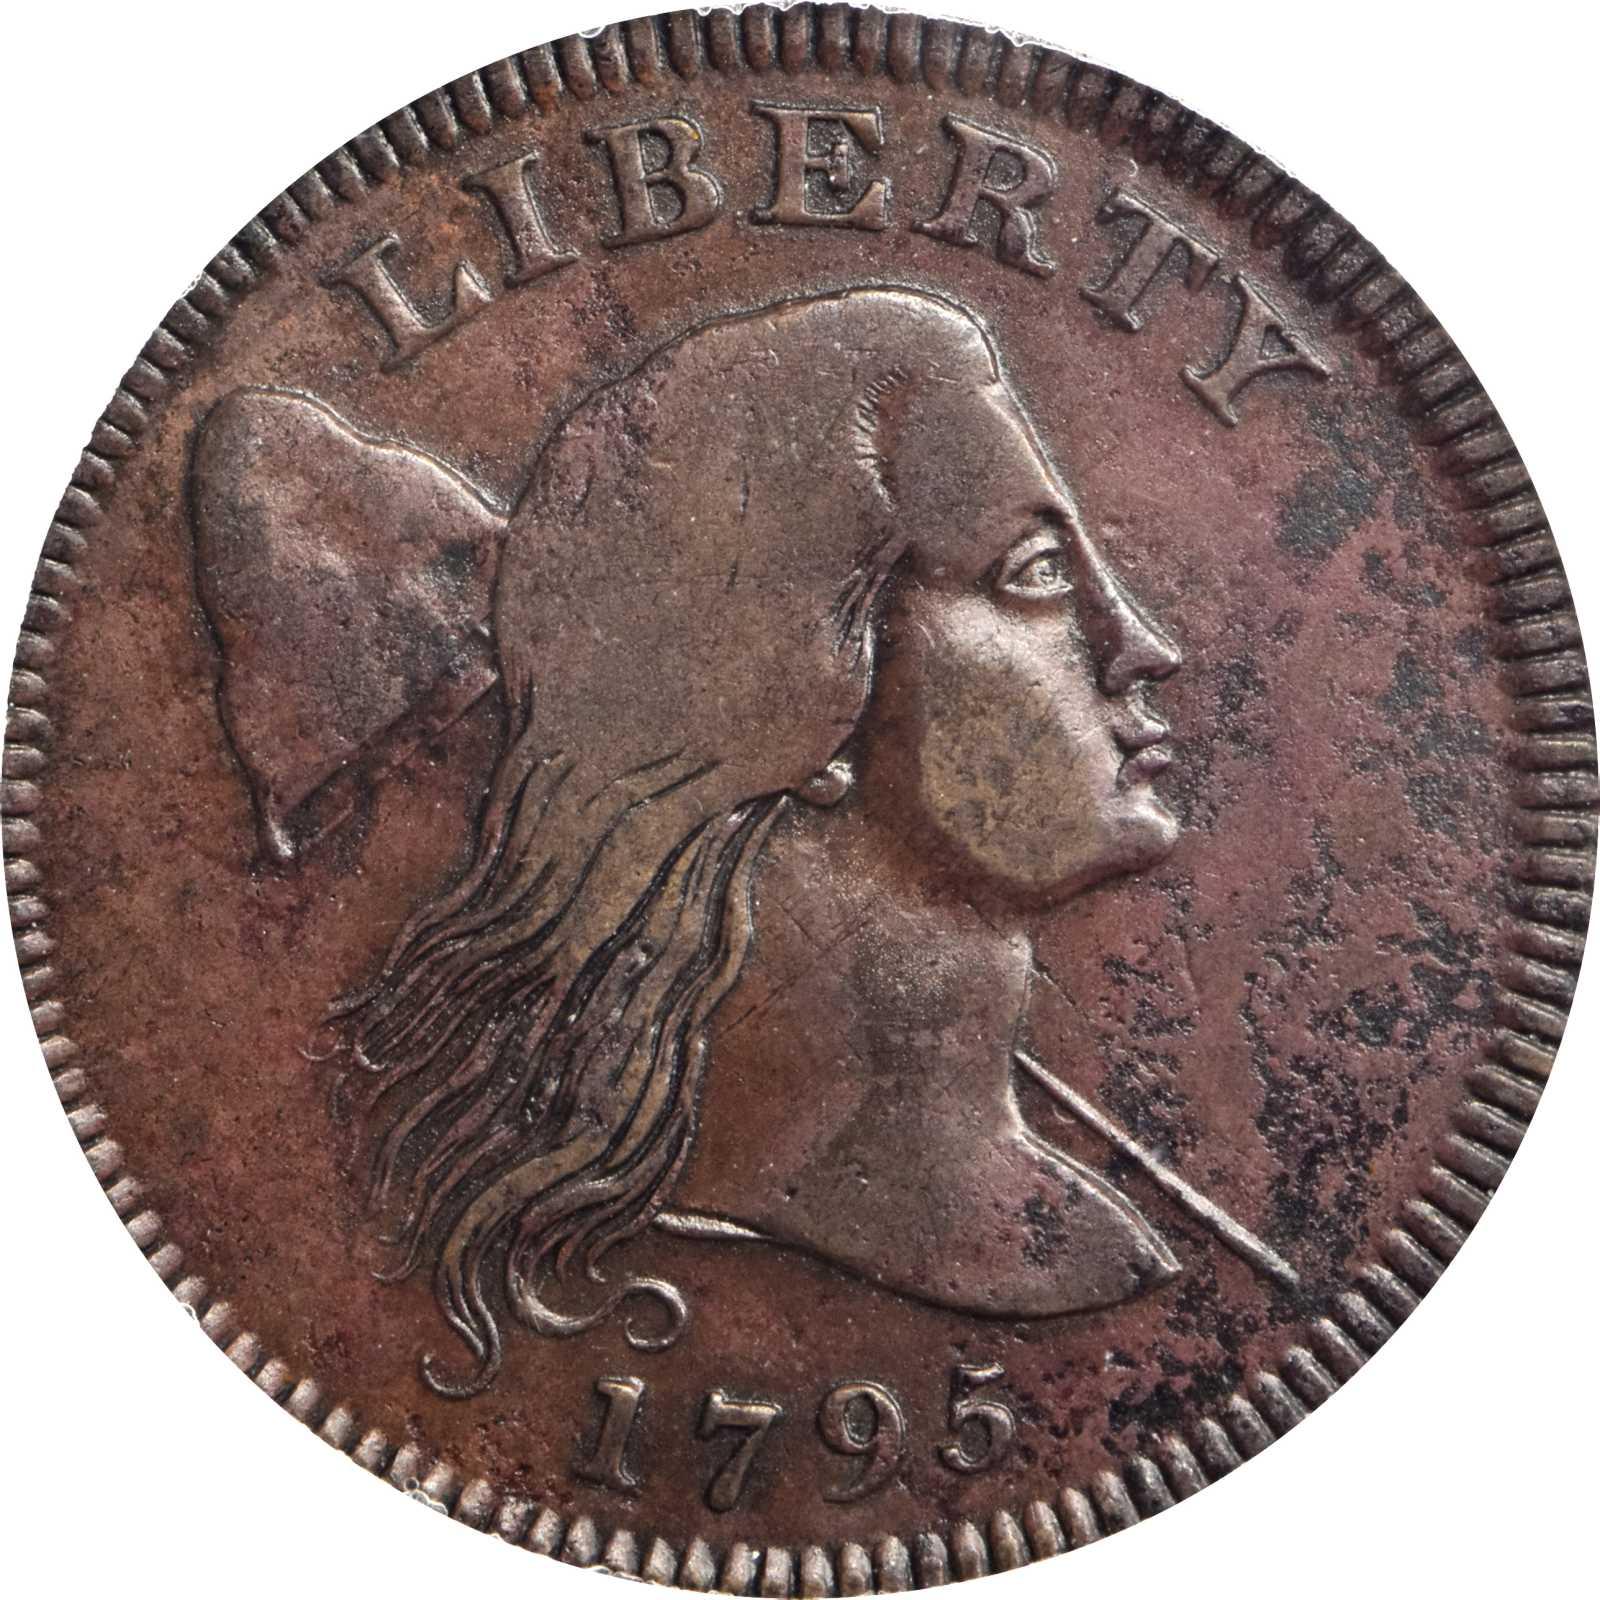 sample image for 1795 Jefferson Hd, LE